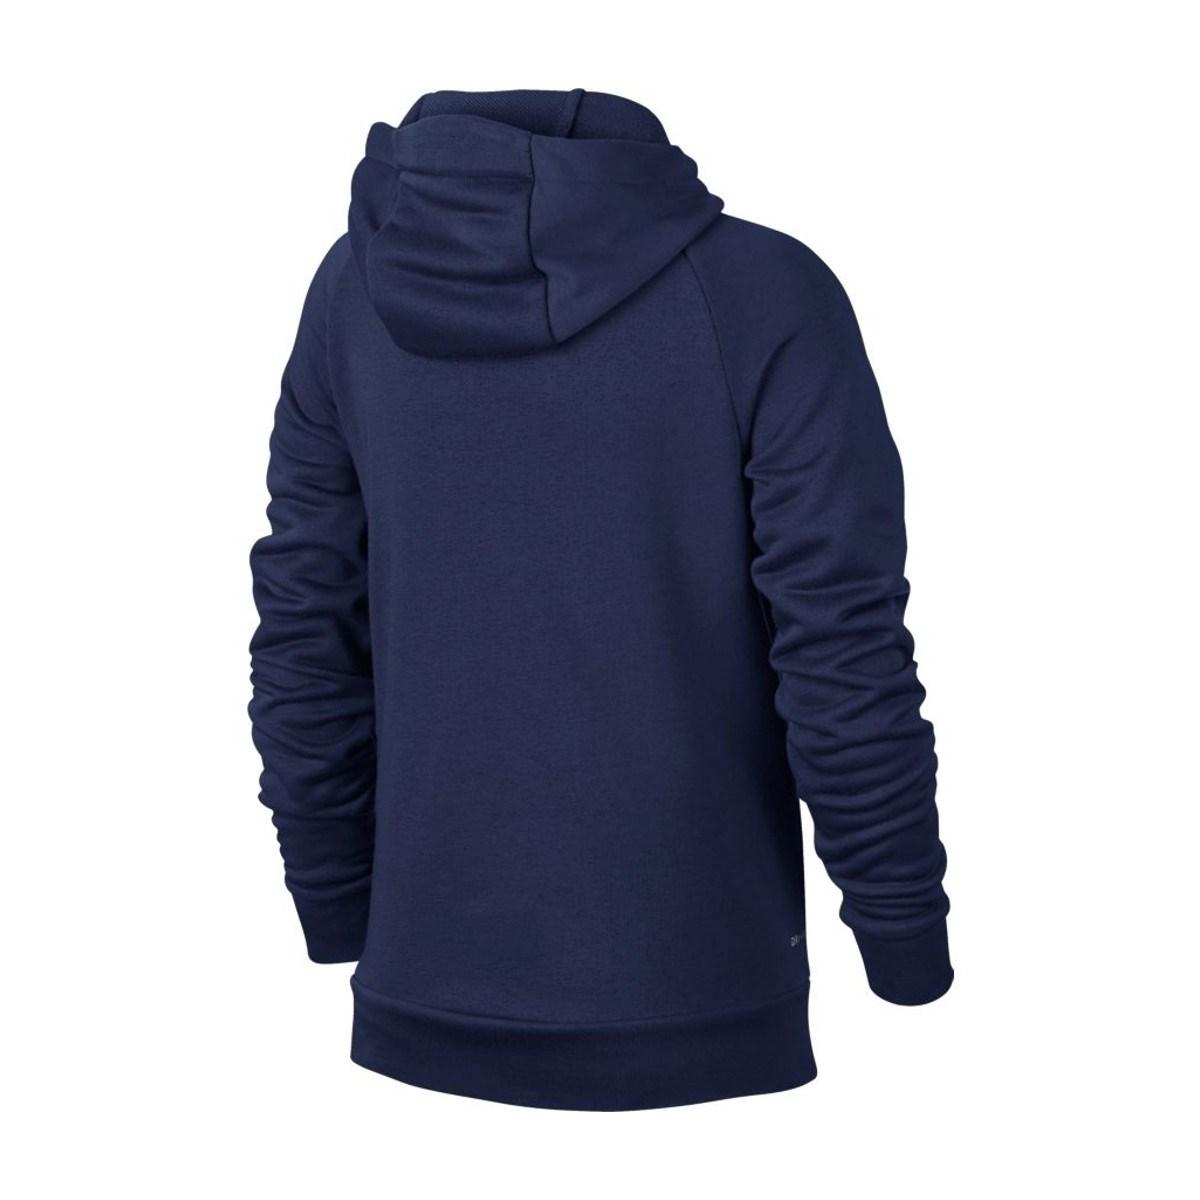 Dry-Fit Çocuk Kapşonlu Lacivert Sweatshirt